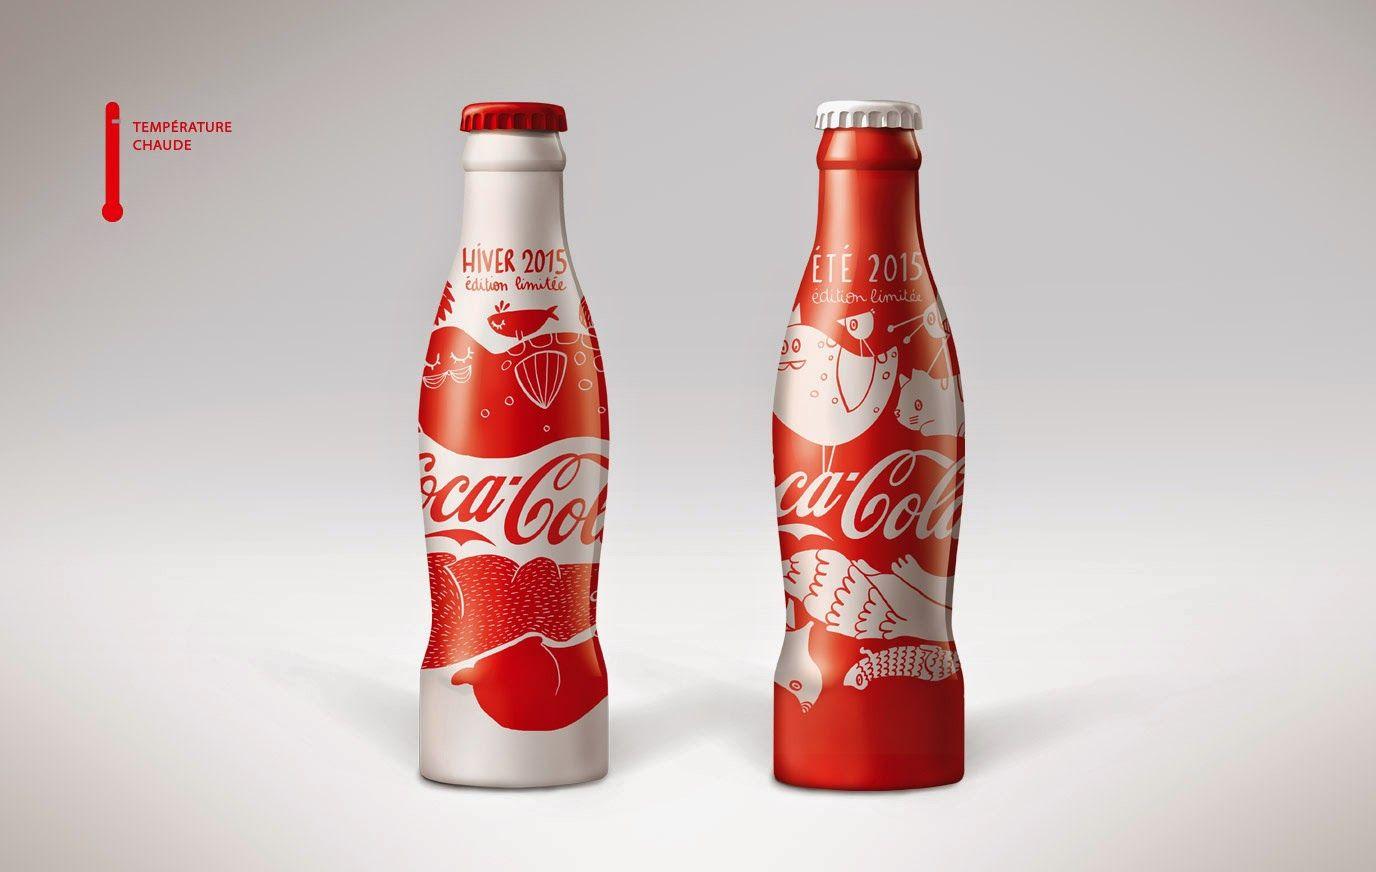 aluminum bottle collector club coca cola summer winter aluminum bottle 2015 france coca. Black Bedroom Furniture Sets. Home Design Ideas